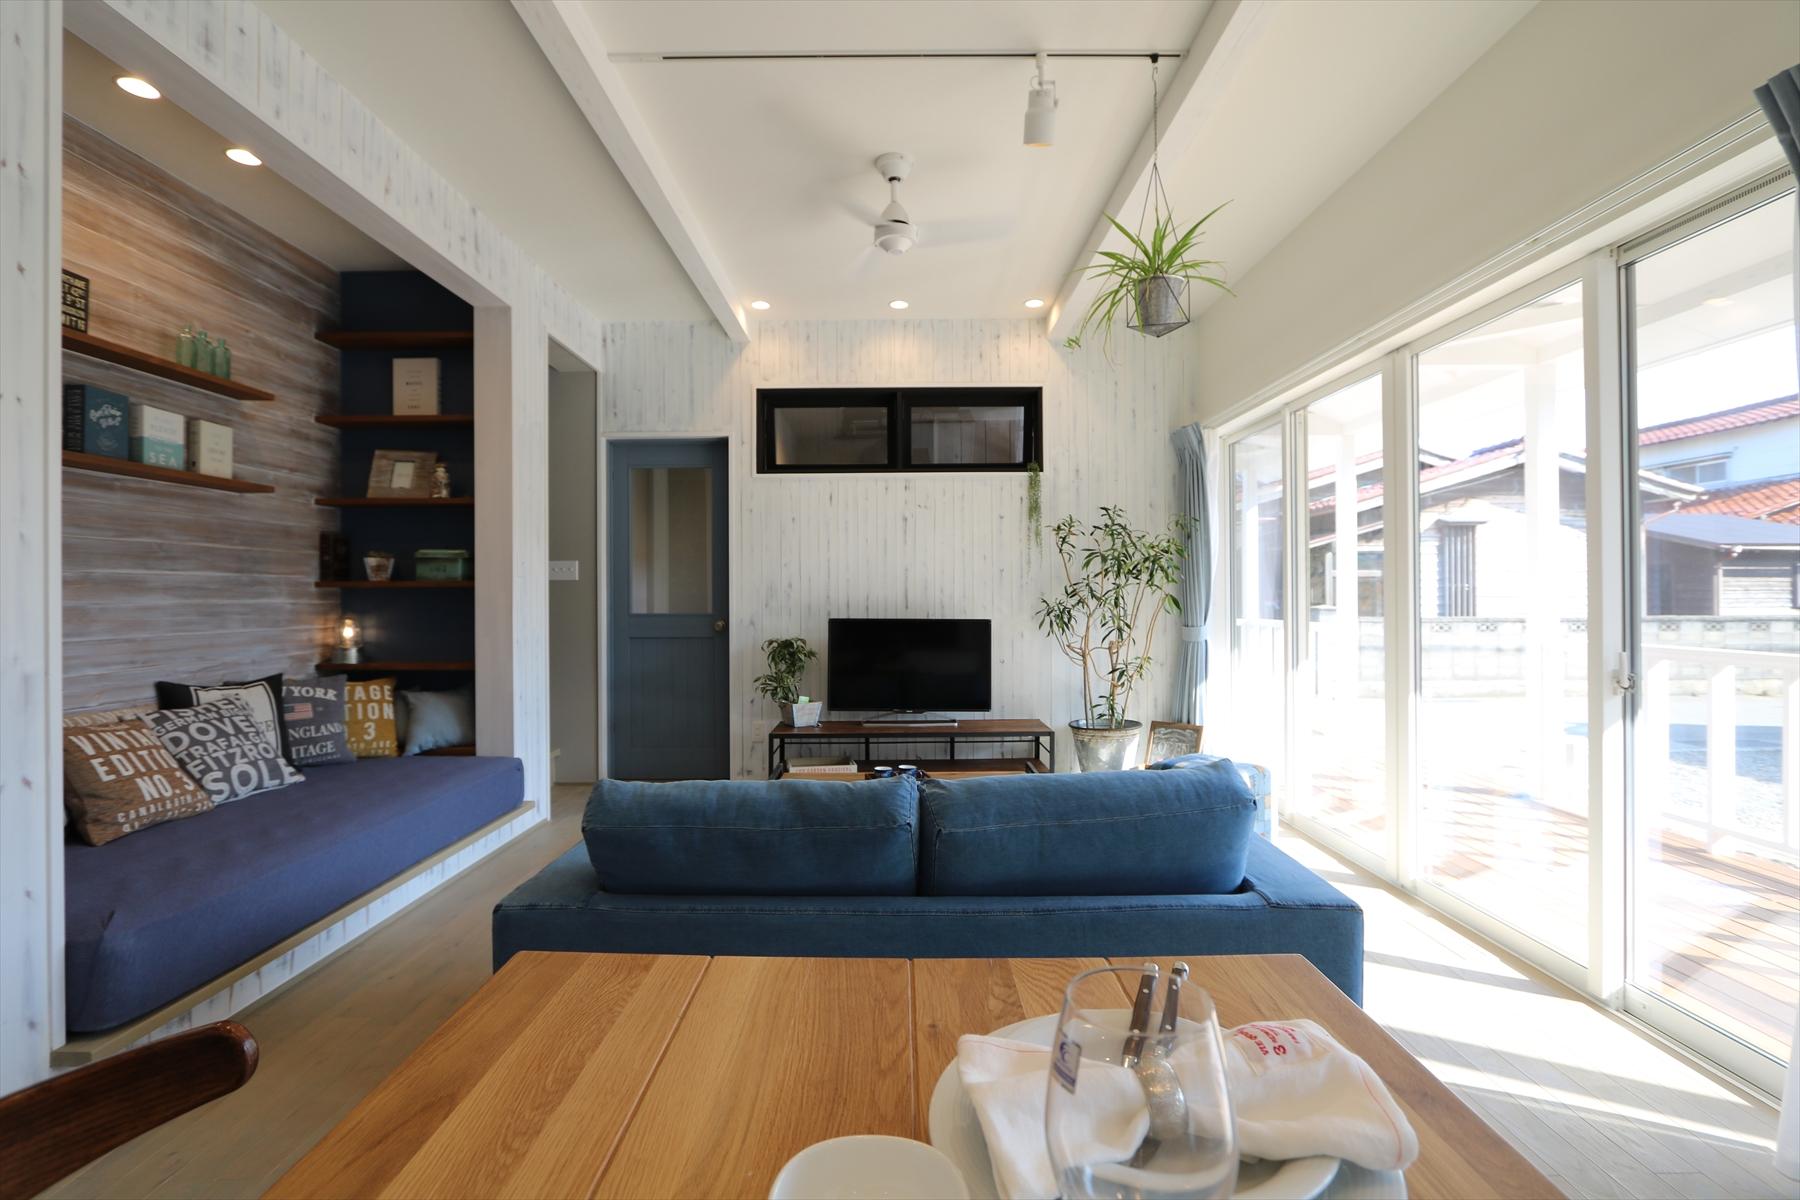 CALIFORNIA HOUSE 2|石川県金沢市の注文住宅・デザイン性・新築の家・戸建て|E-HOUSE